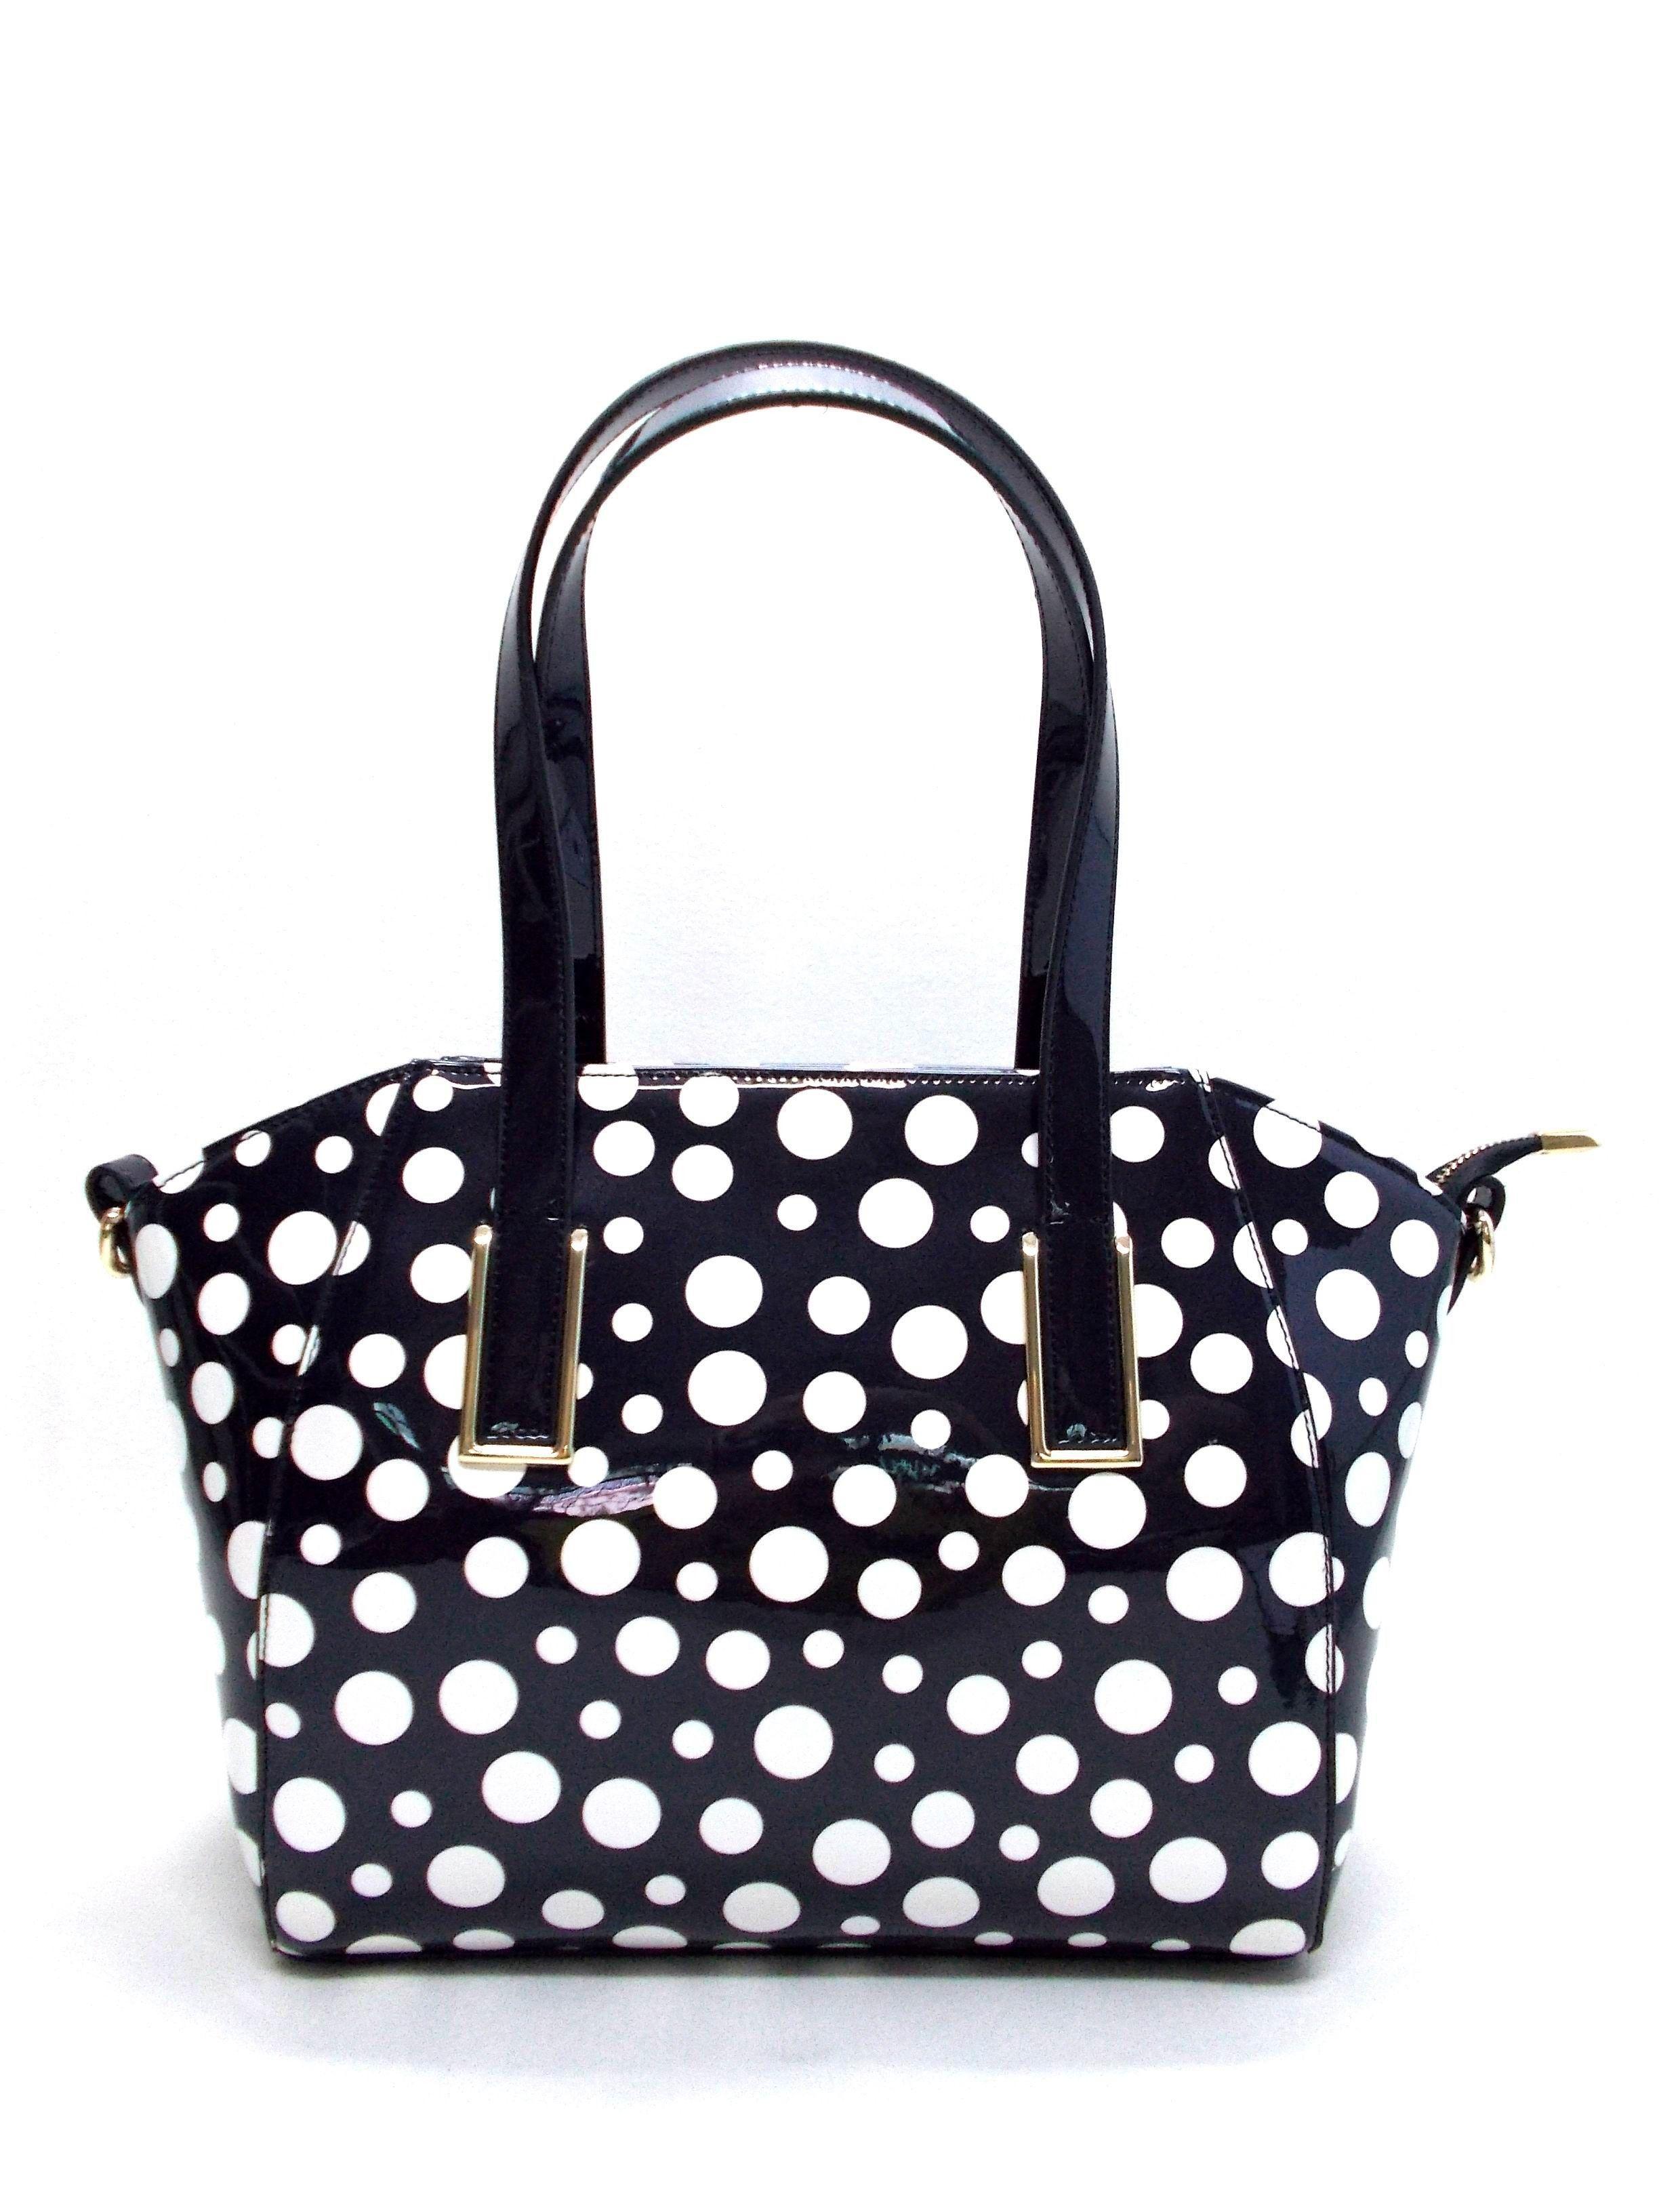 Love This Spotty Kelly Brown Handbag Tatum Black White Spots